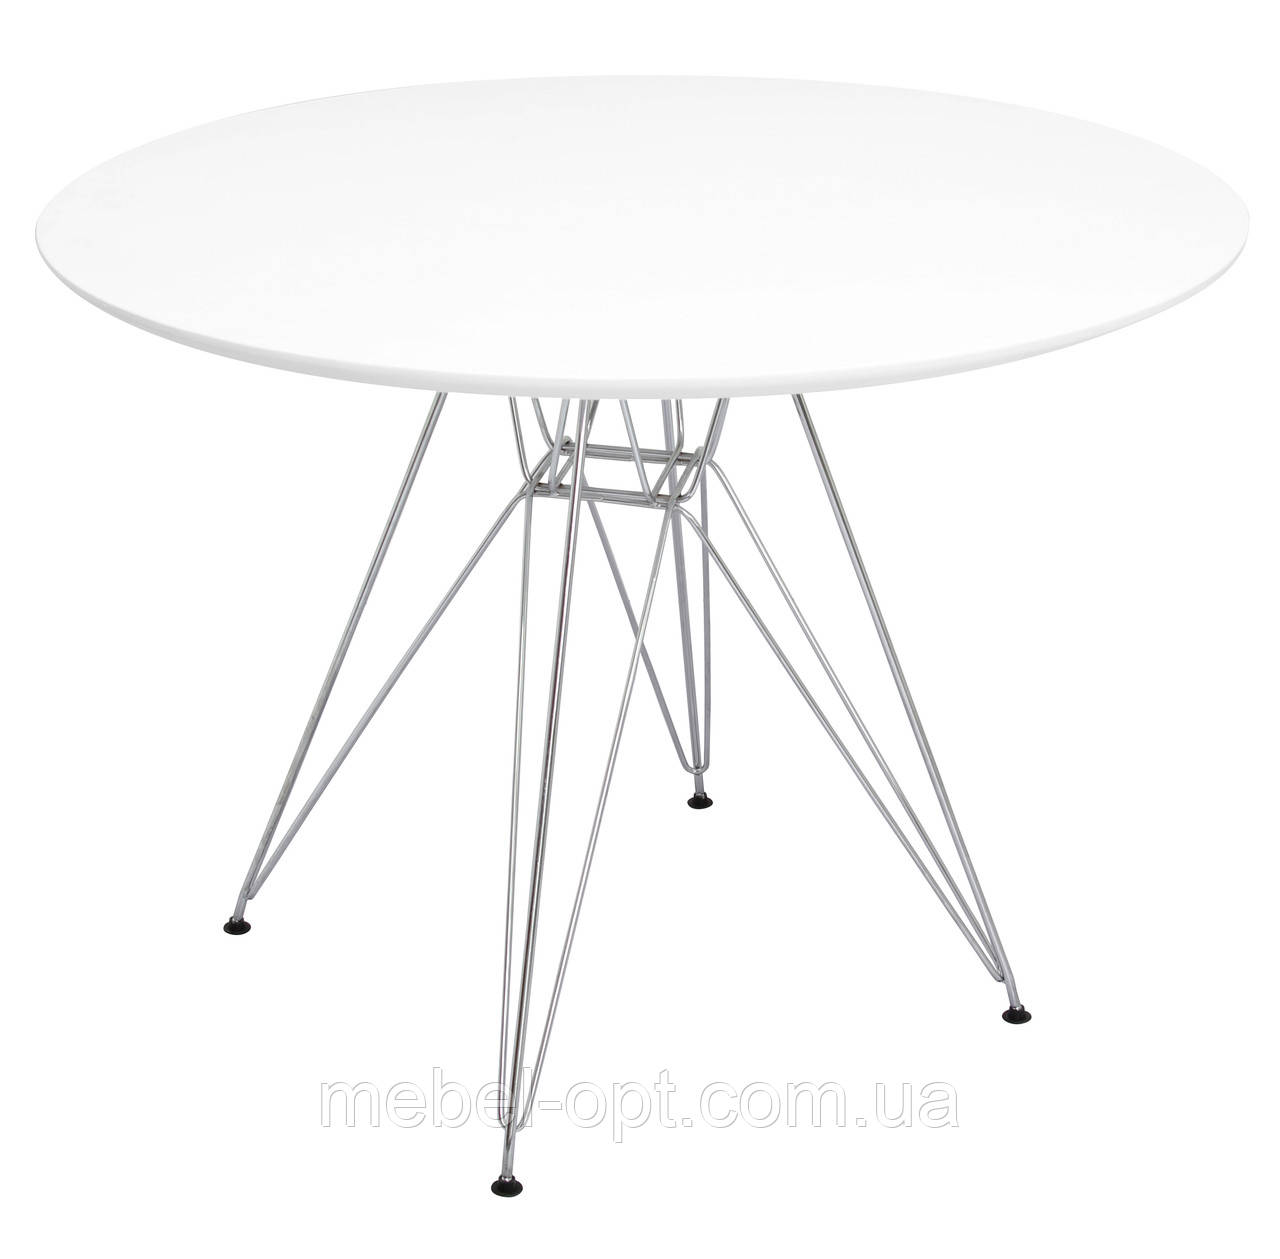 стол обеденный прайз круглый диаметр 80см круглый стол на металлических ножках Eames Eiffel Leg Table